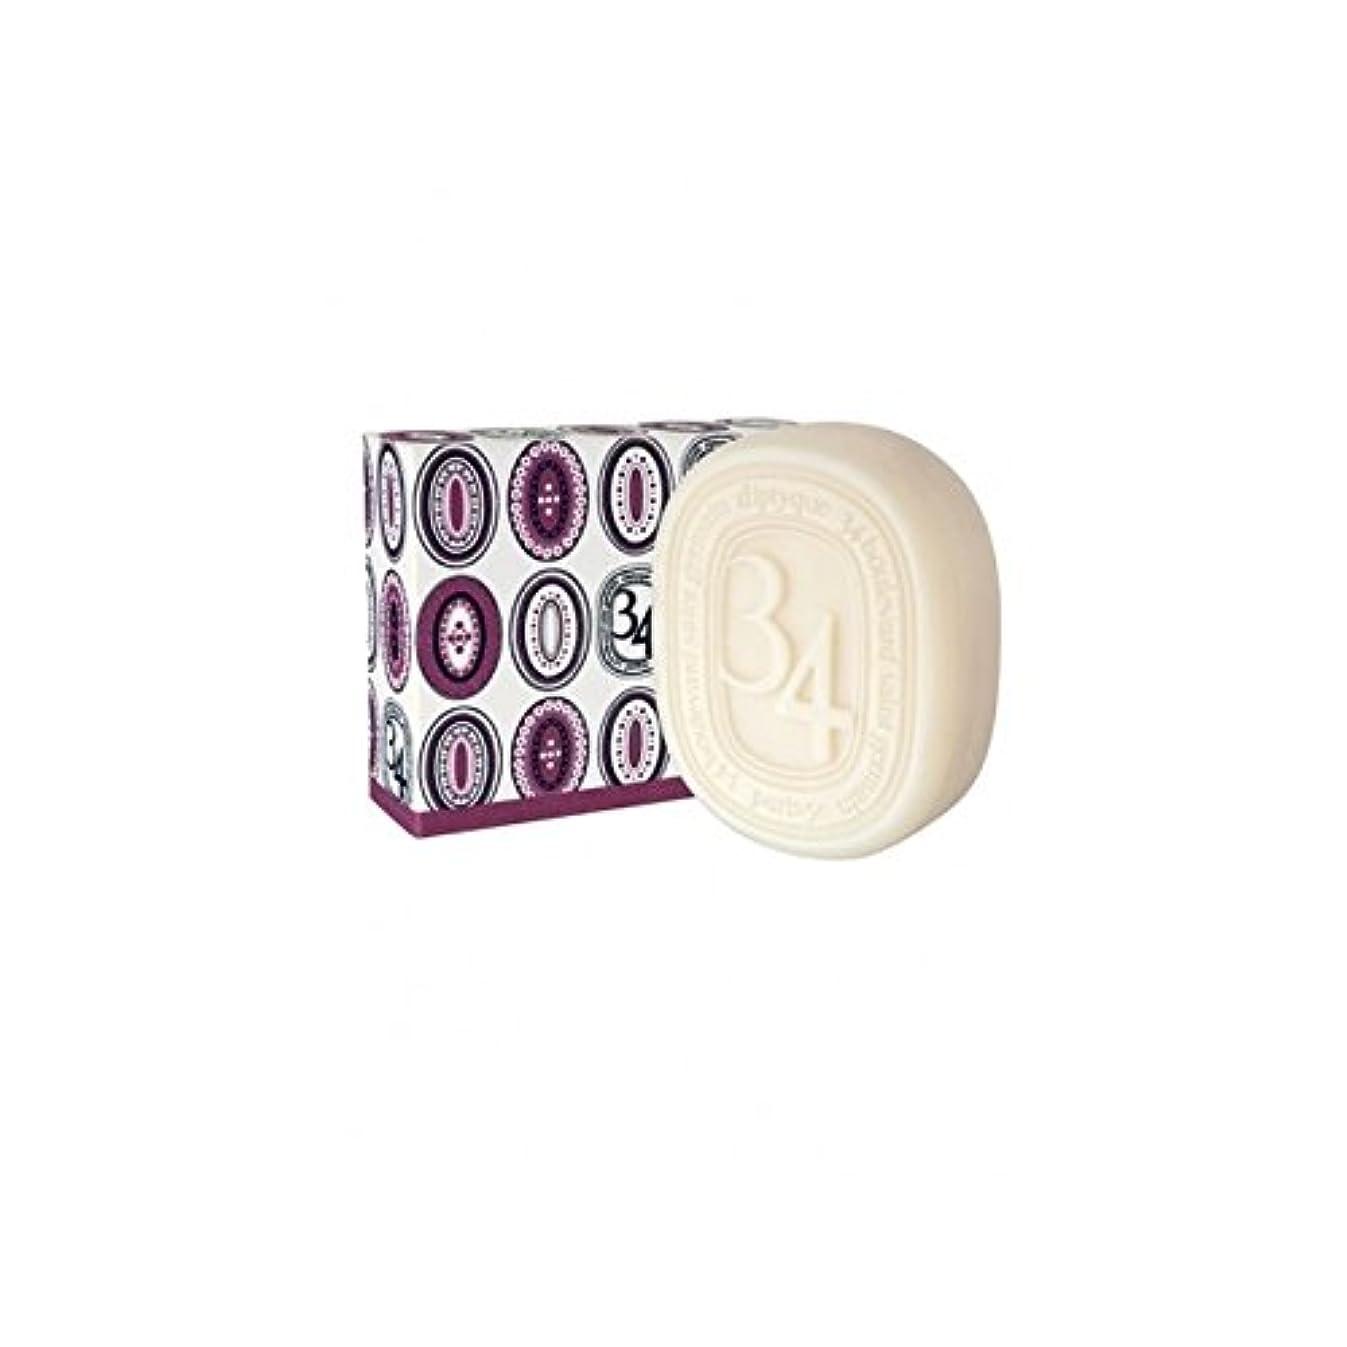 Diptyque Collection 34 Boulevard Saint Germain Soap 100g (Pack of 2) - Diptyqueコレクション34大通りサンジェルマン石鹸100グラム (x2)...